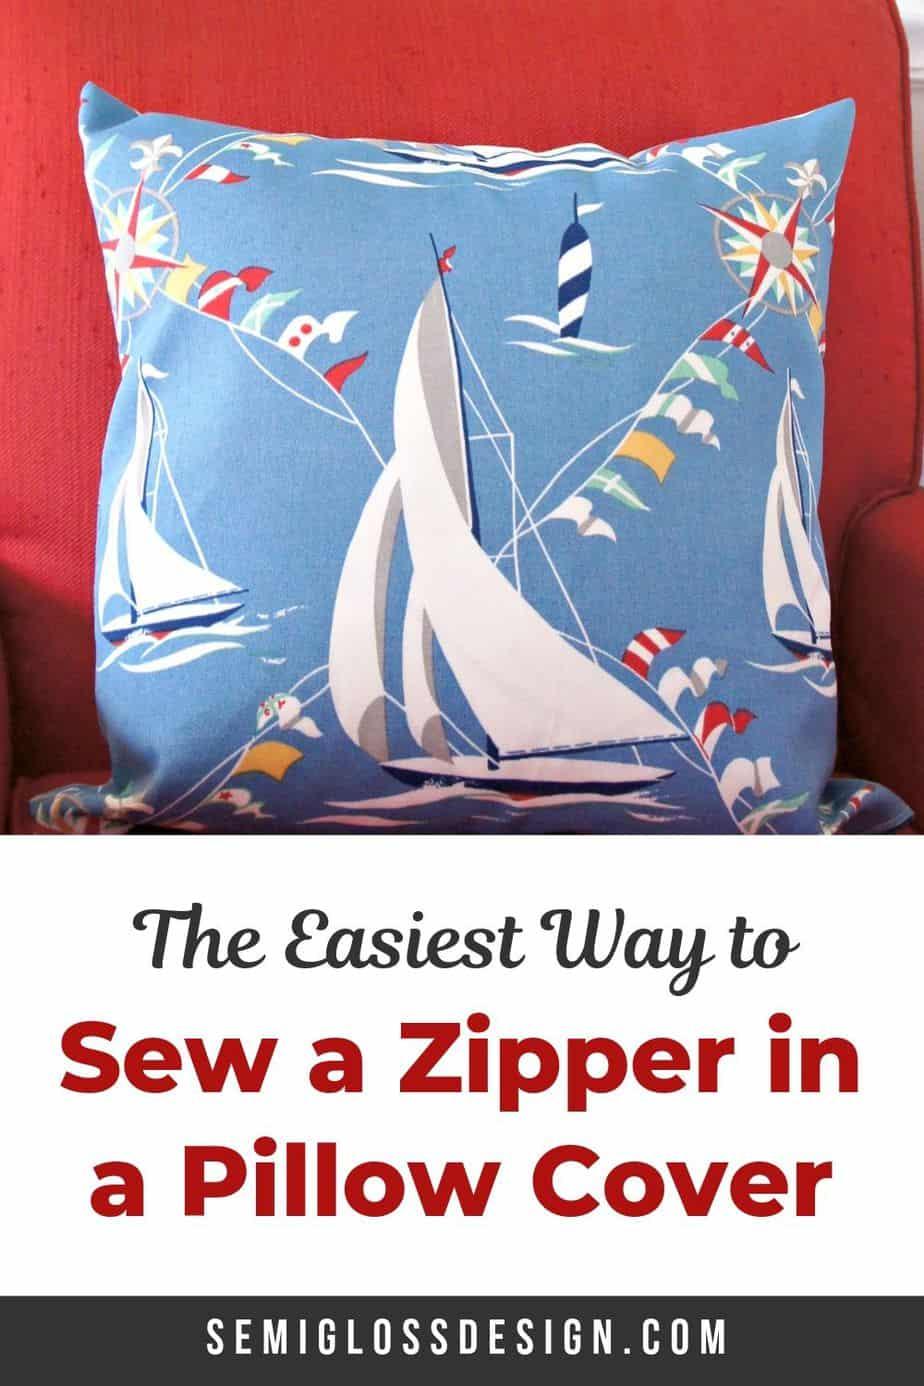 sew a zipper in a pillow